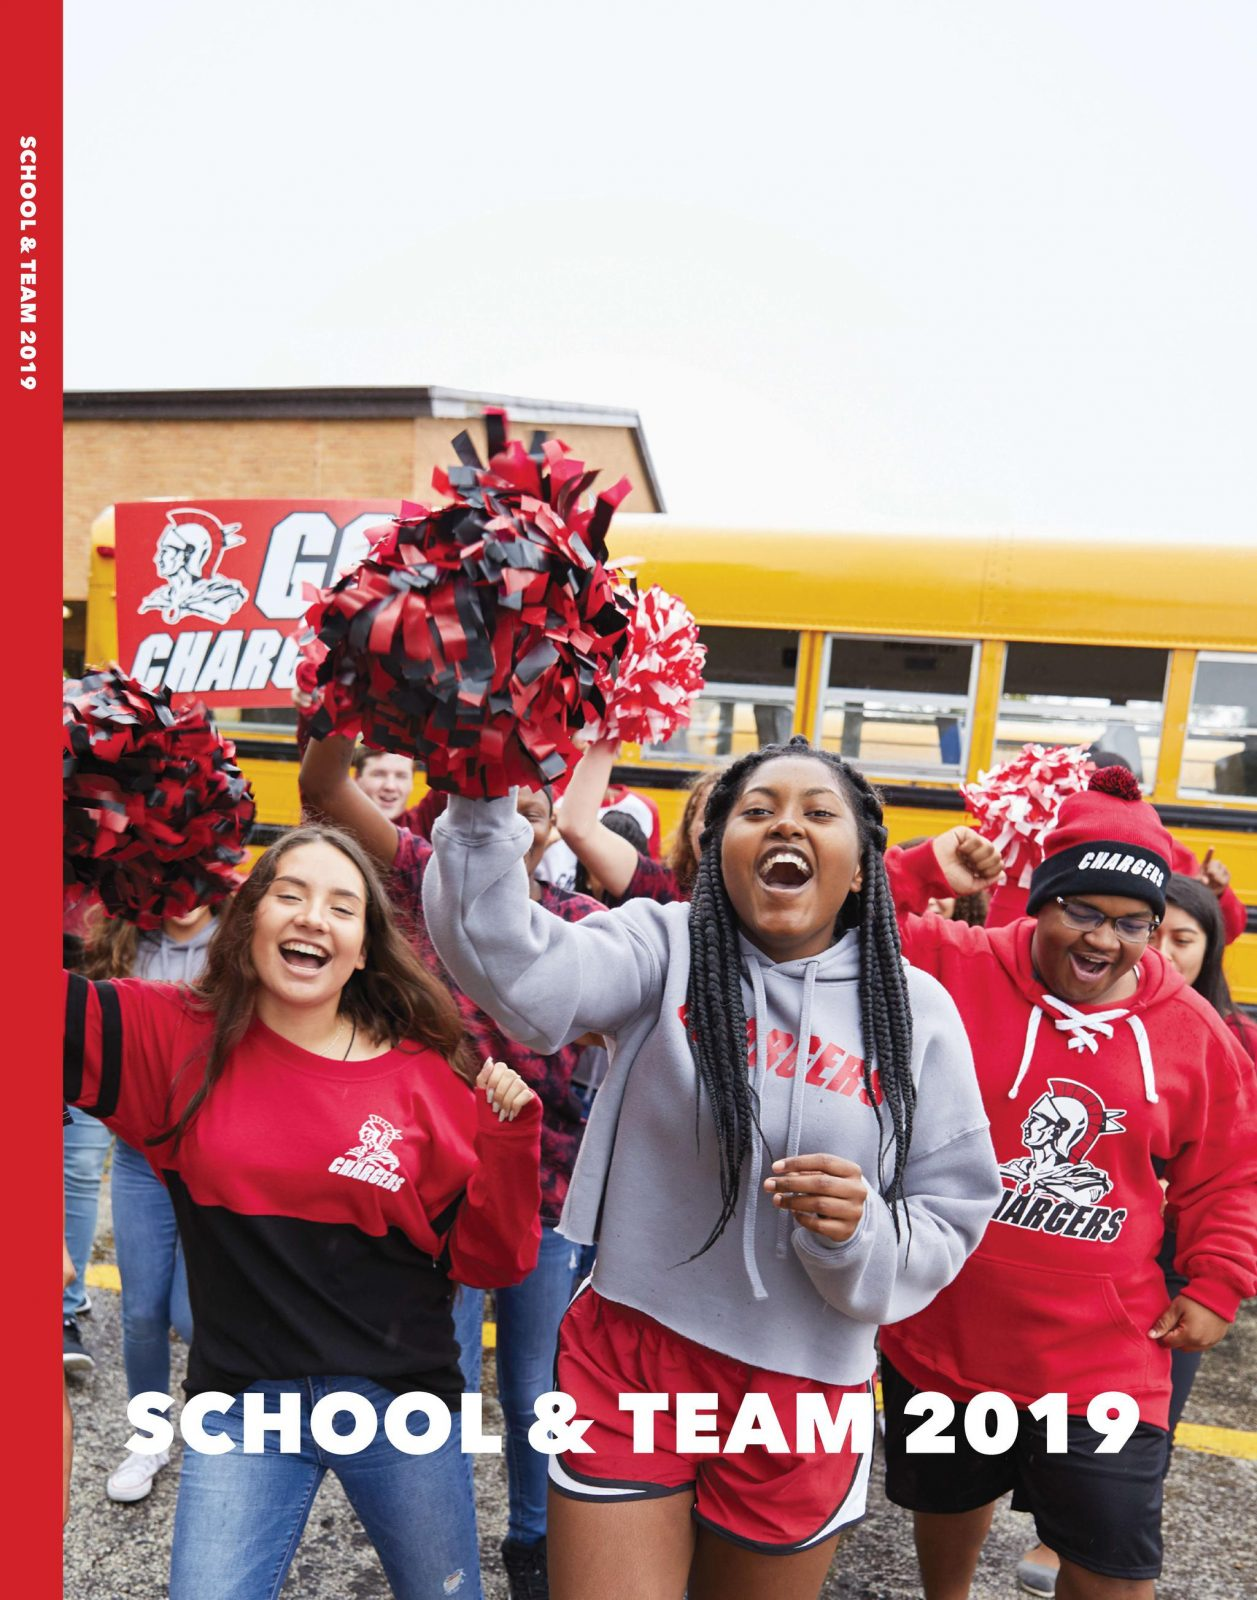 school spirit 2019